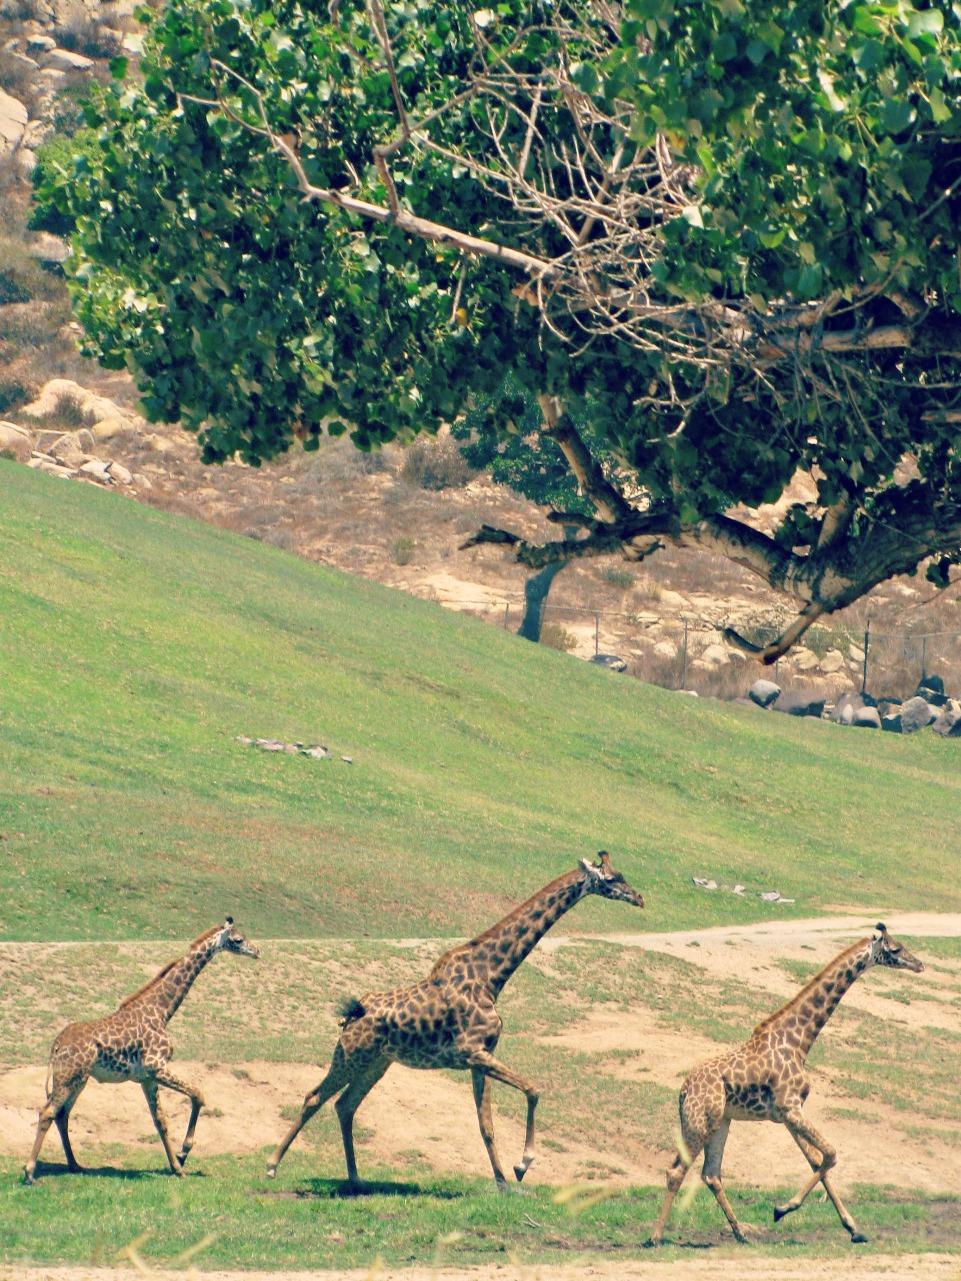 San Diego Safari Park // Running Giraffes